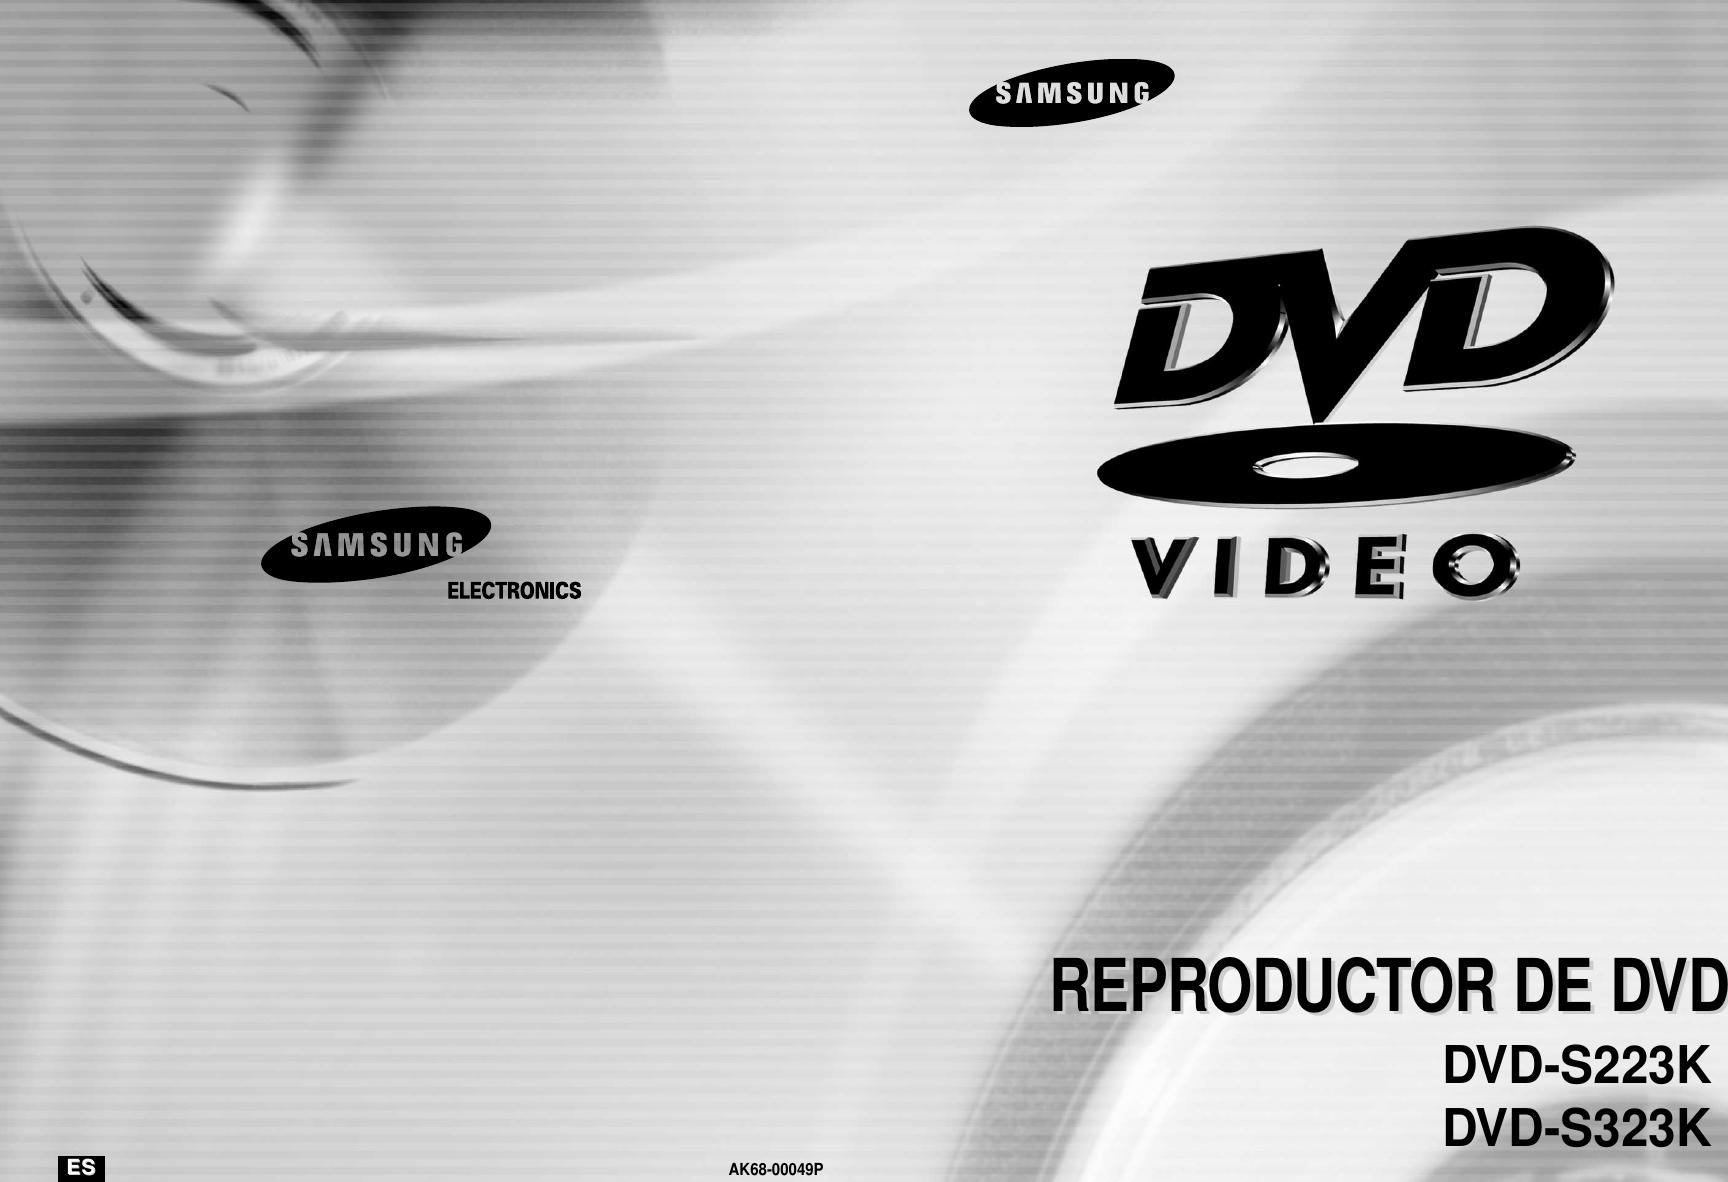 Samsung DVD S323K 20030313150228125 00049PS223K